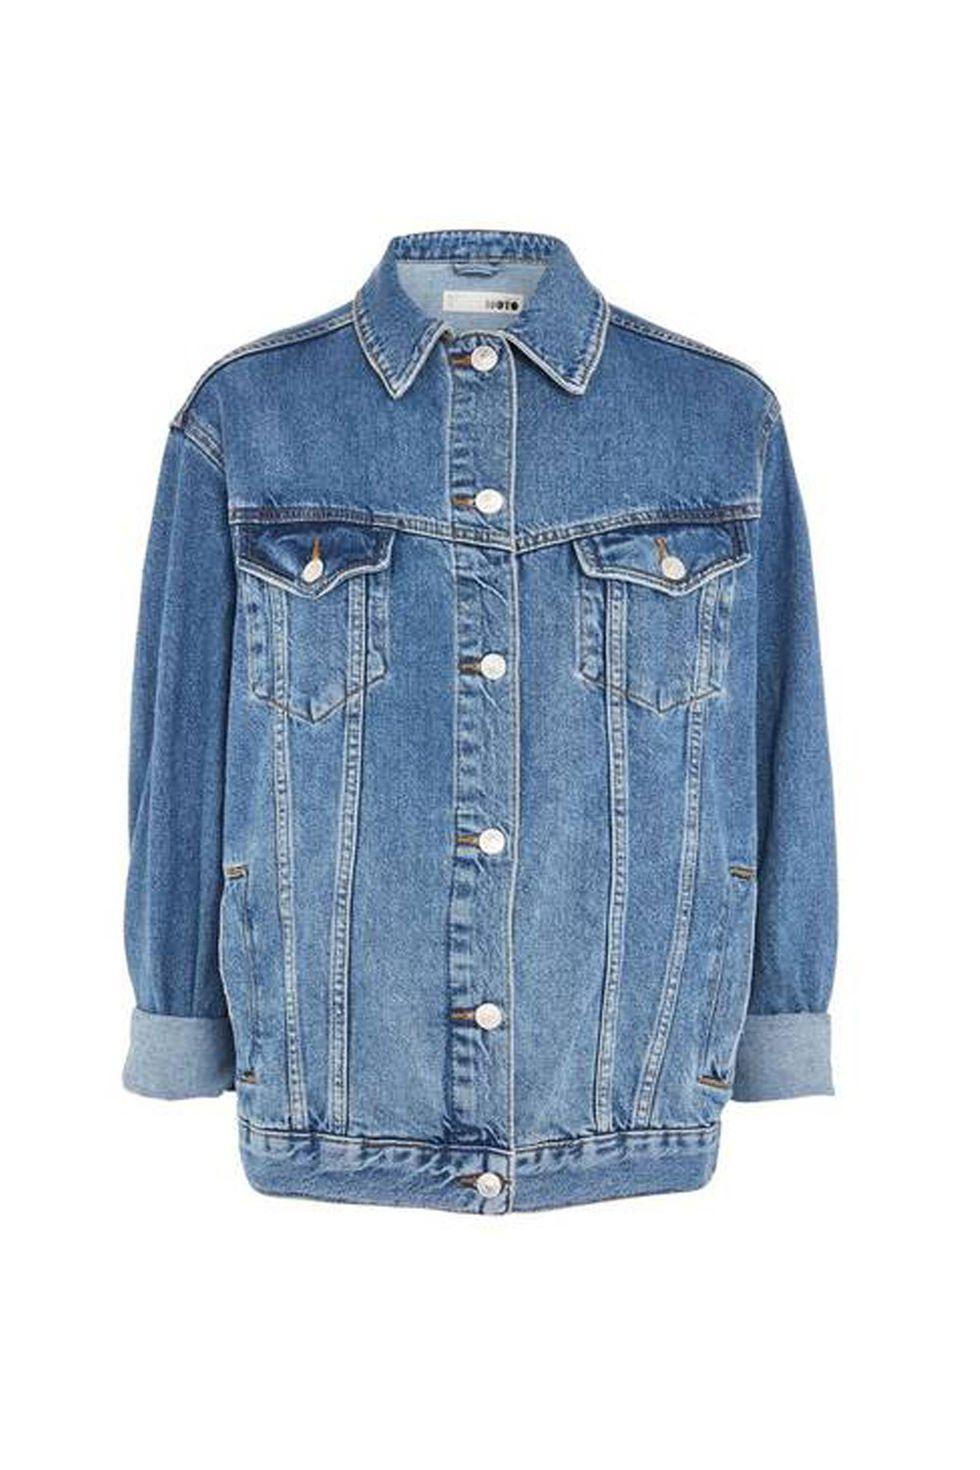 Denim Jackets That Ll Become Your Year Round Uniform Denim Jean Jacket Outfits Oversized Denim Jacket Petite Denim Jacket [ 1470 x 980 Pixel ]